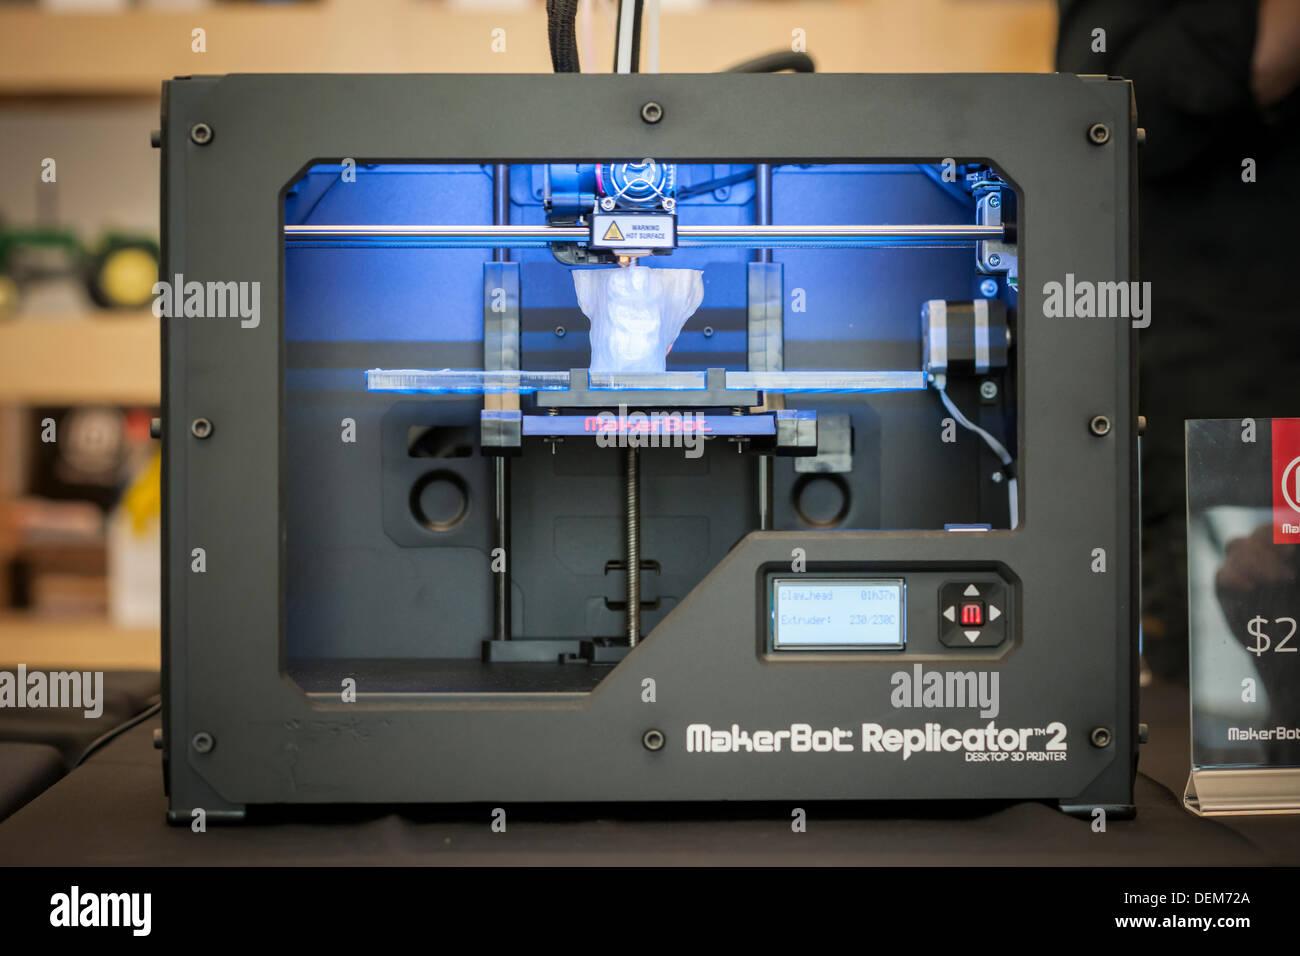 D Printer Exhibition Usa : Makerbot d printer stock photos makerbot d printer stock